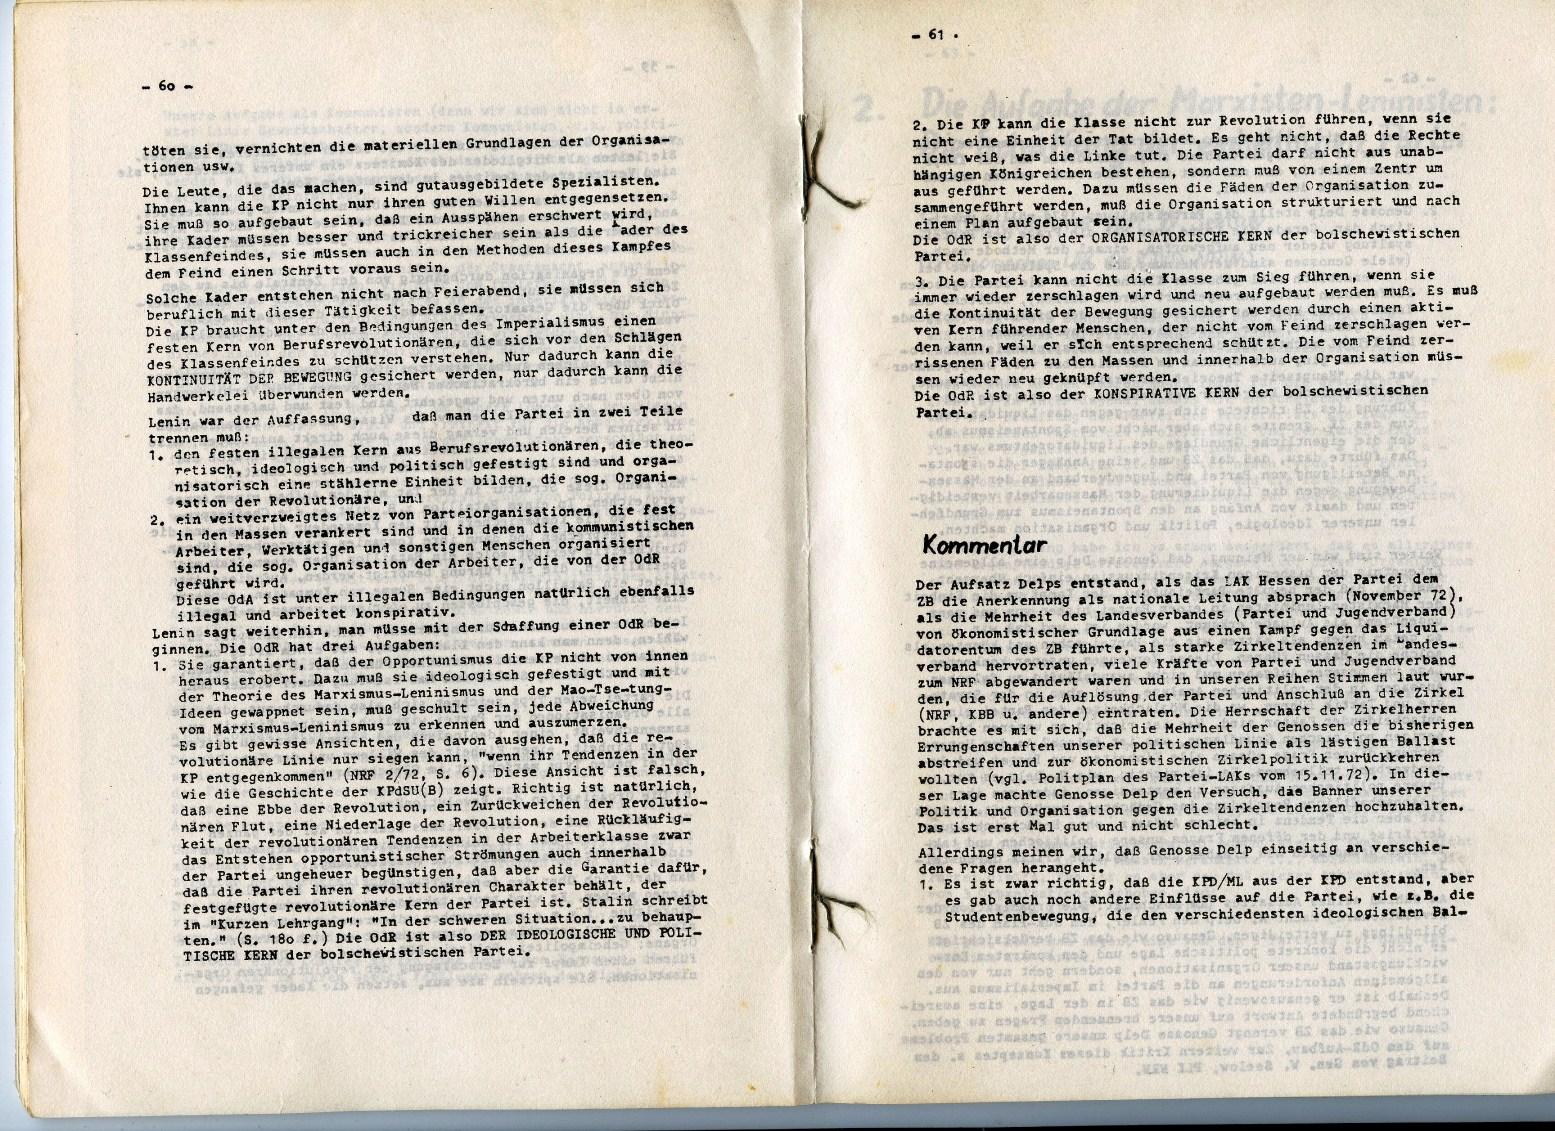 ZB_Universitas_1972_34